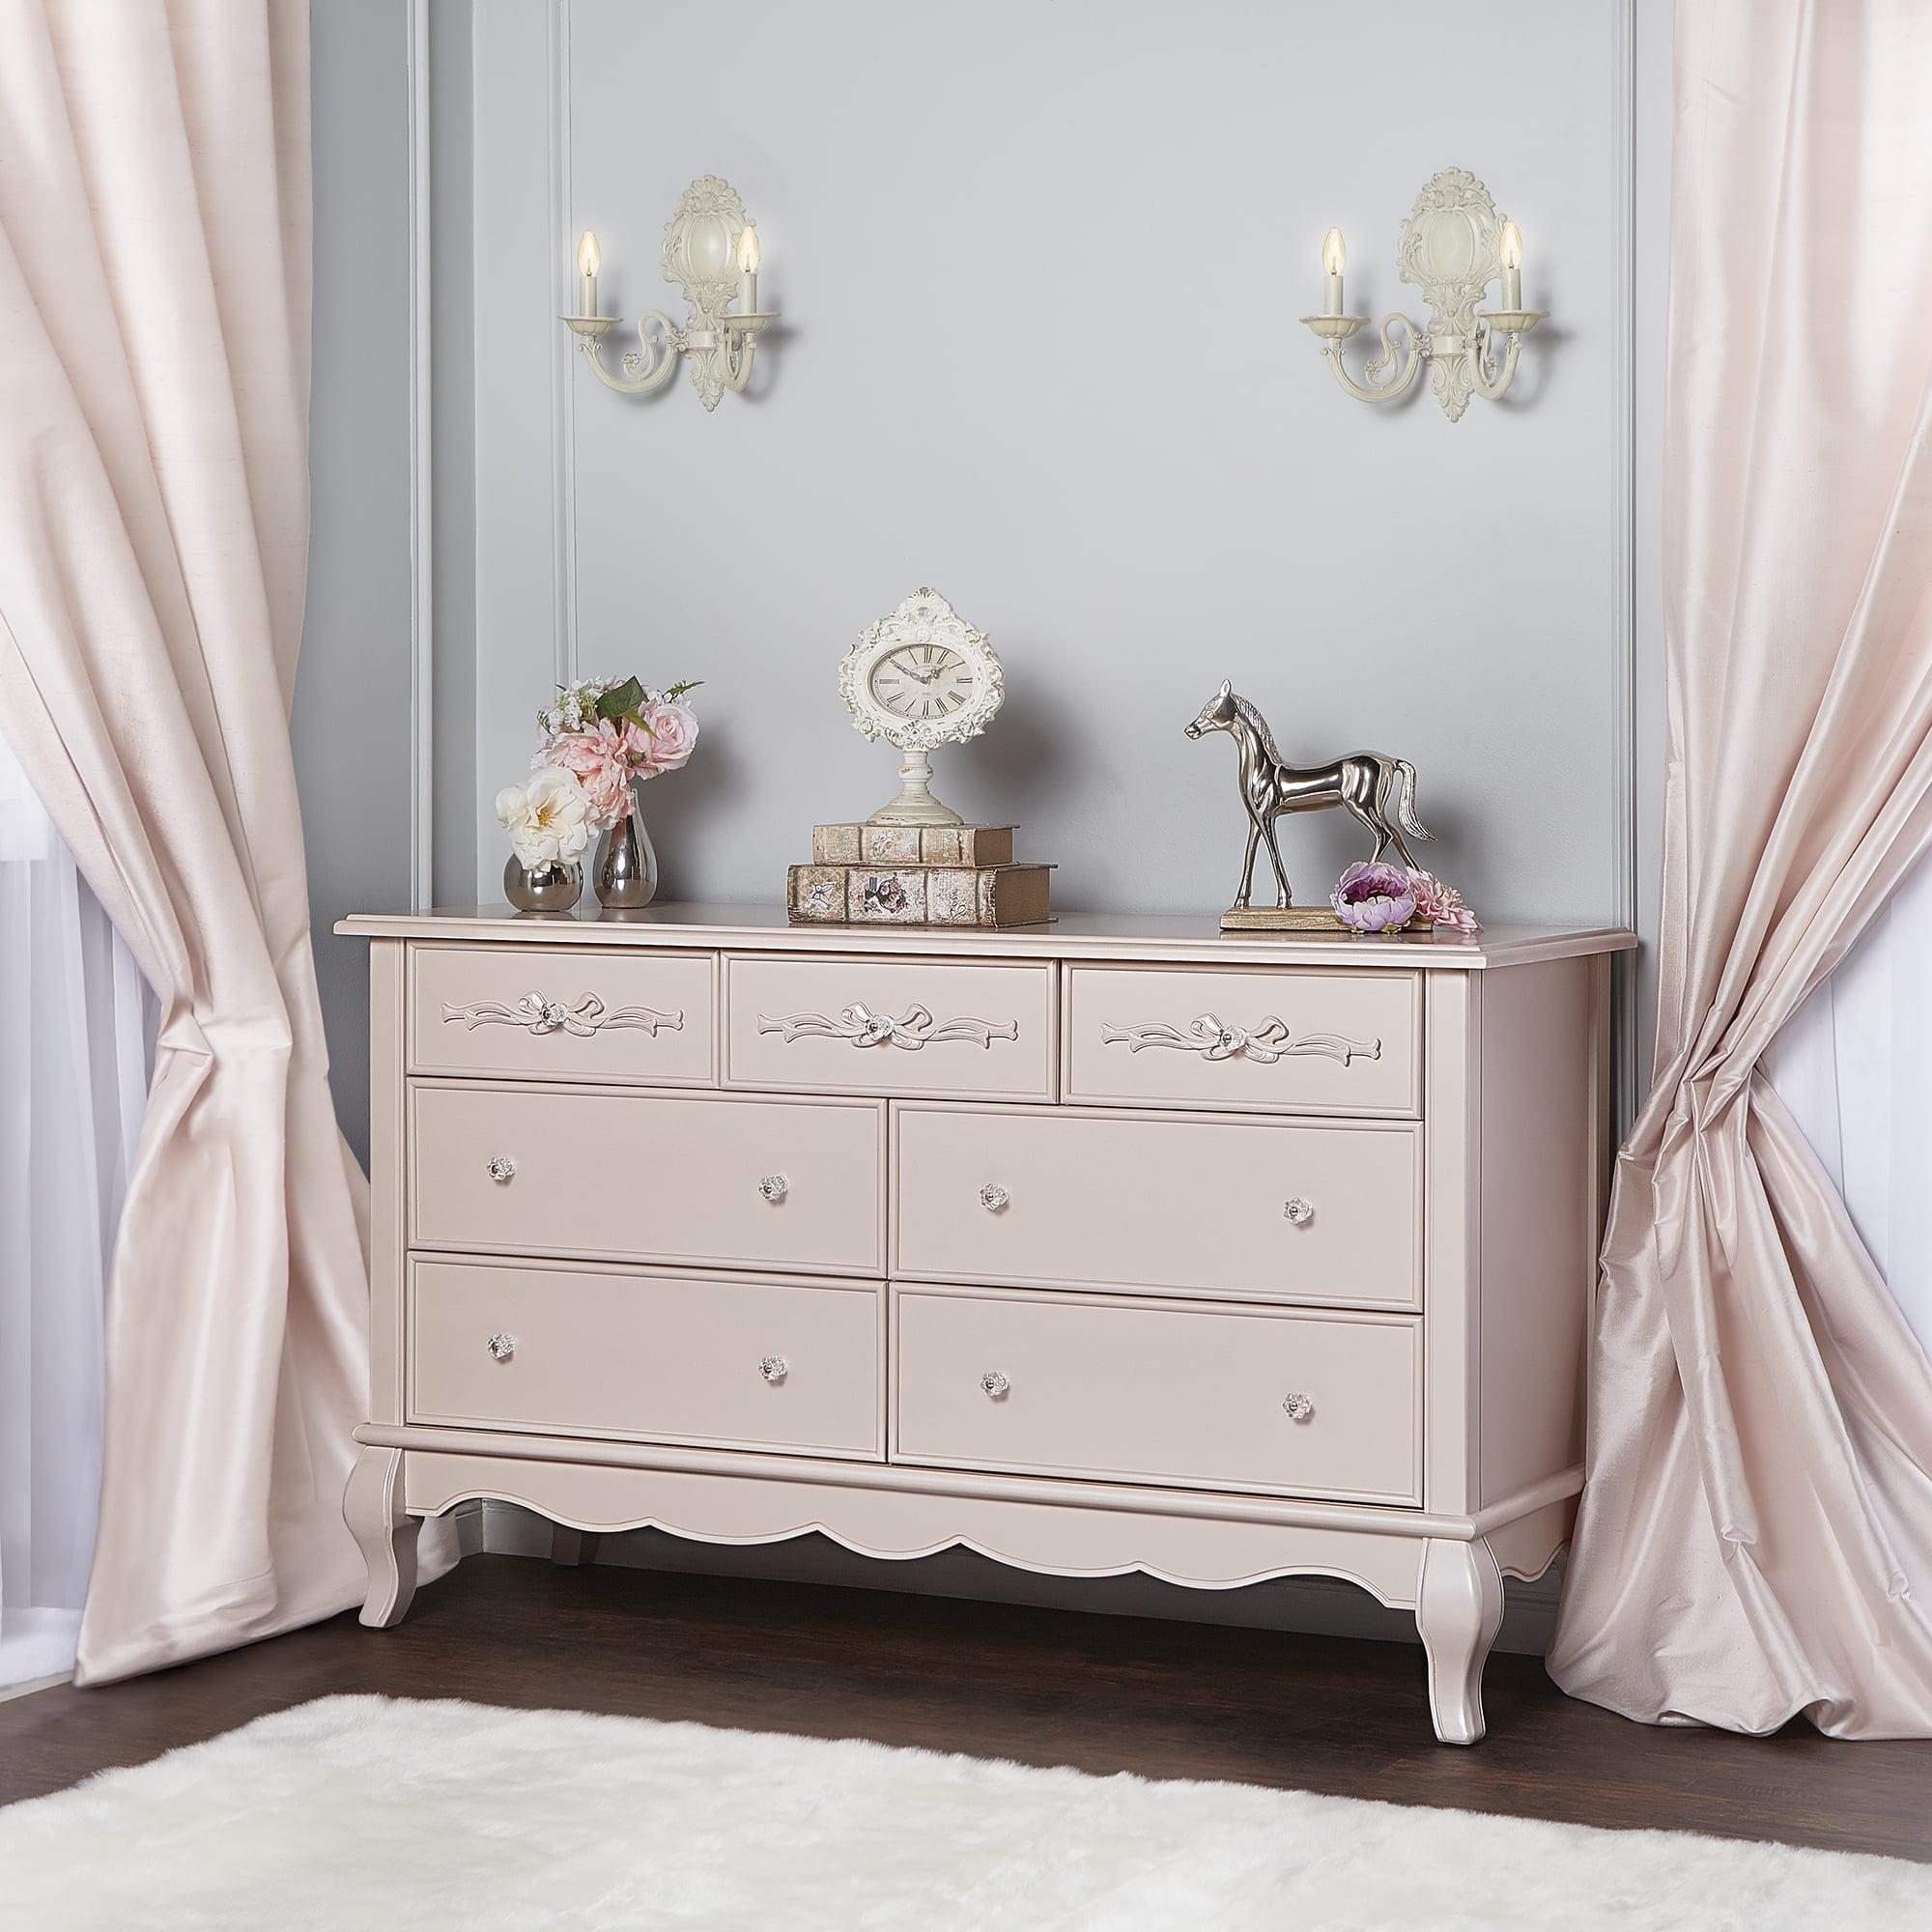 Evolur Aurora 7-Drawer Double Dresser, Ivory Lace by Evolur